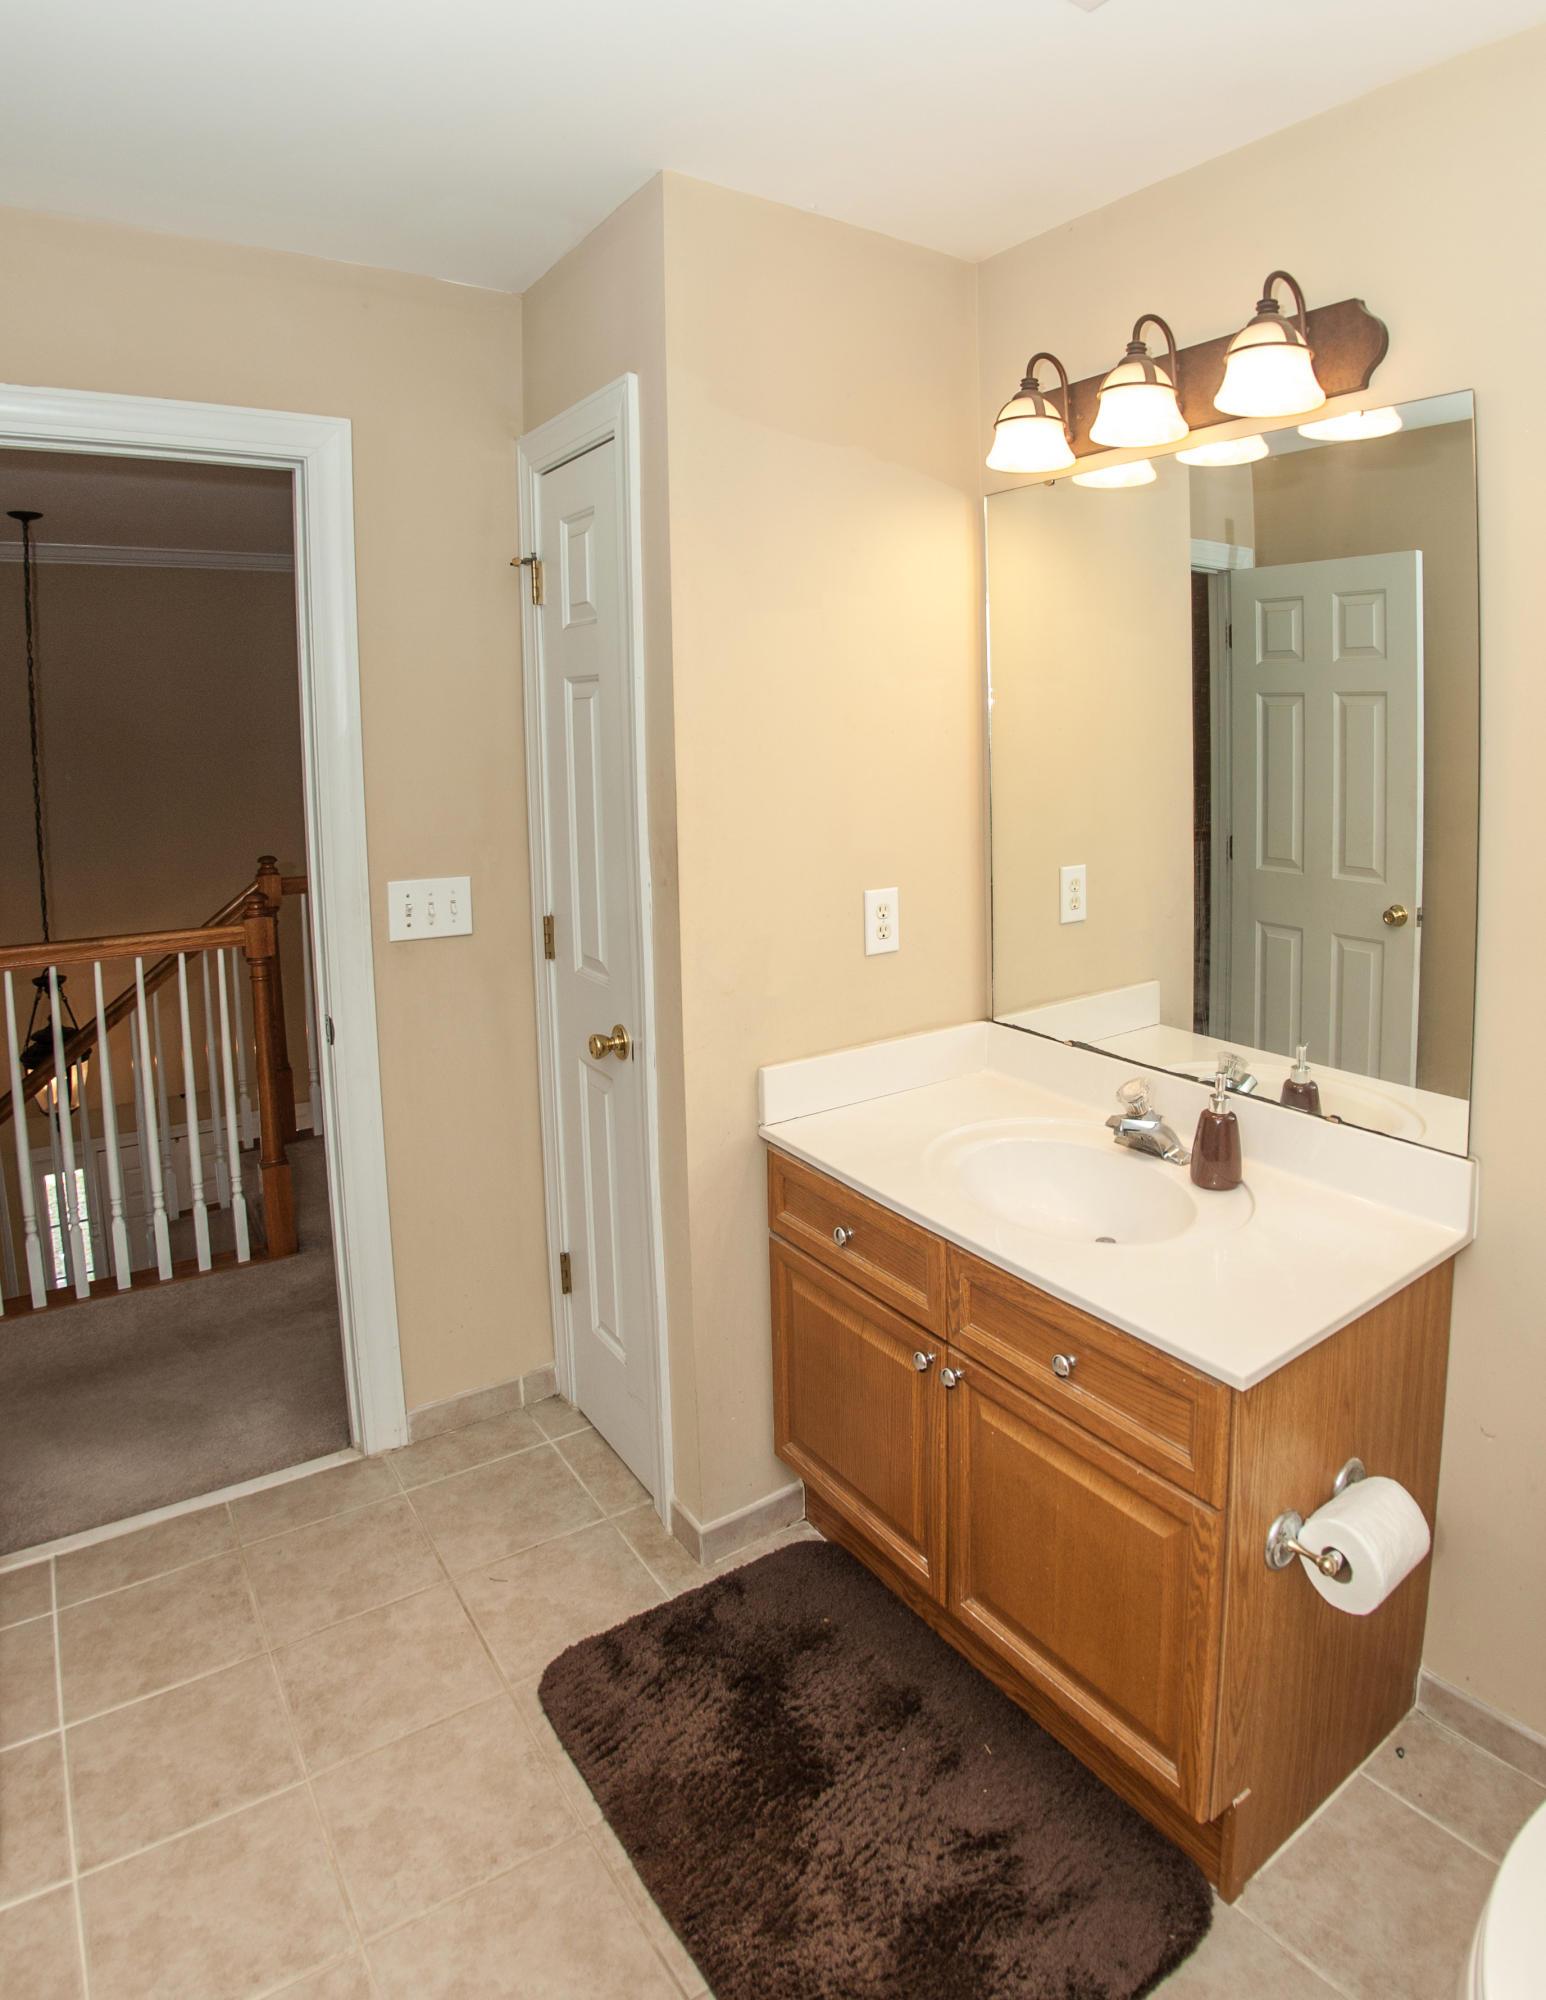 Dunes West Homes For Sale - 2520 Deer Walk, Mount Pleasant, SC - 54